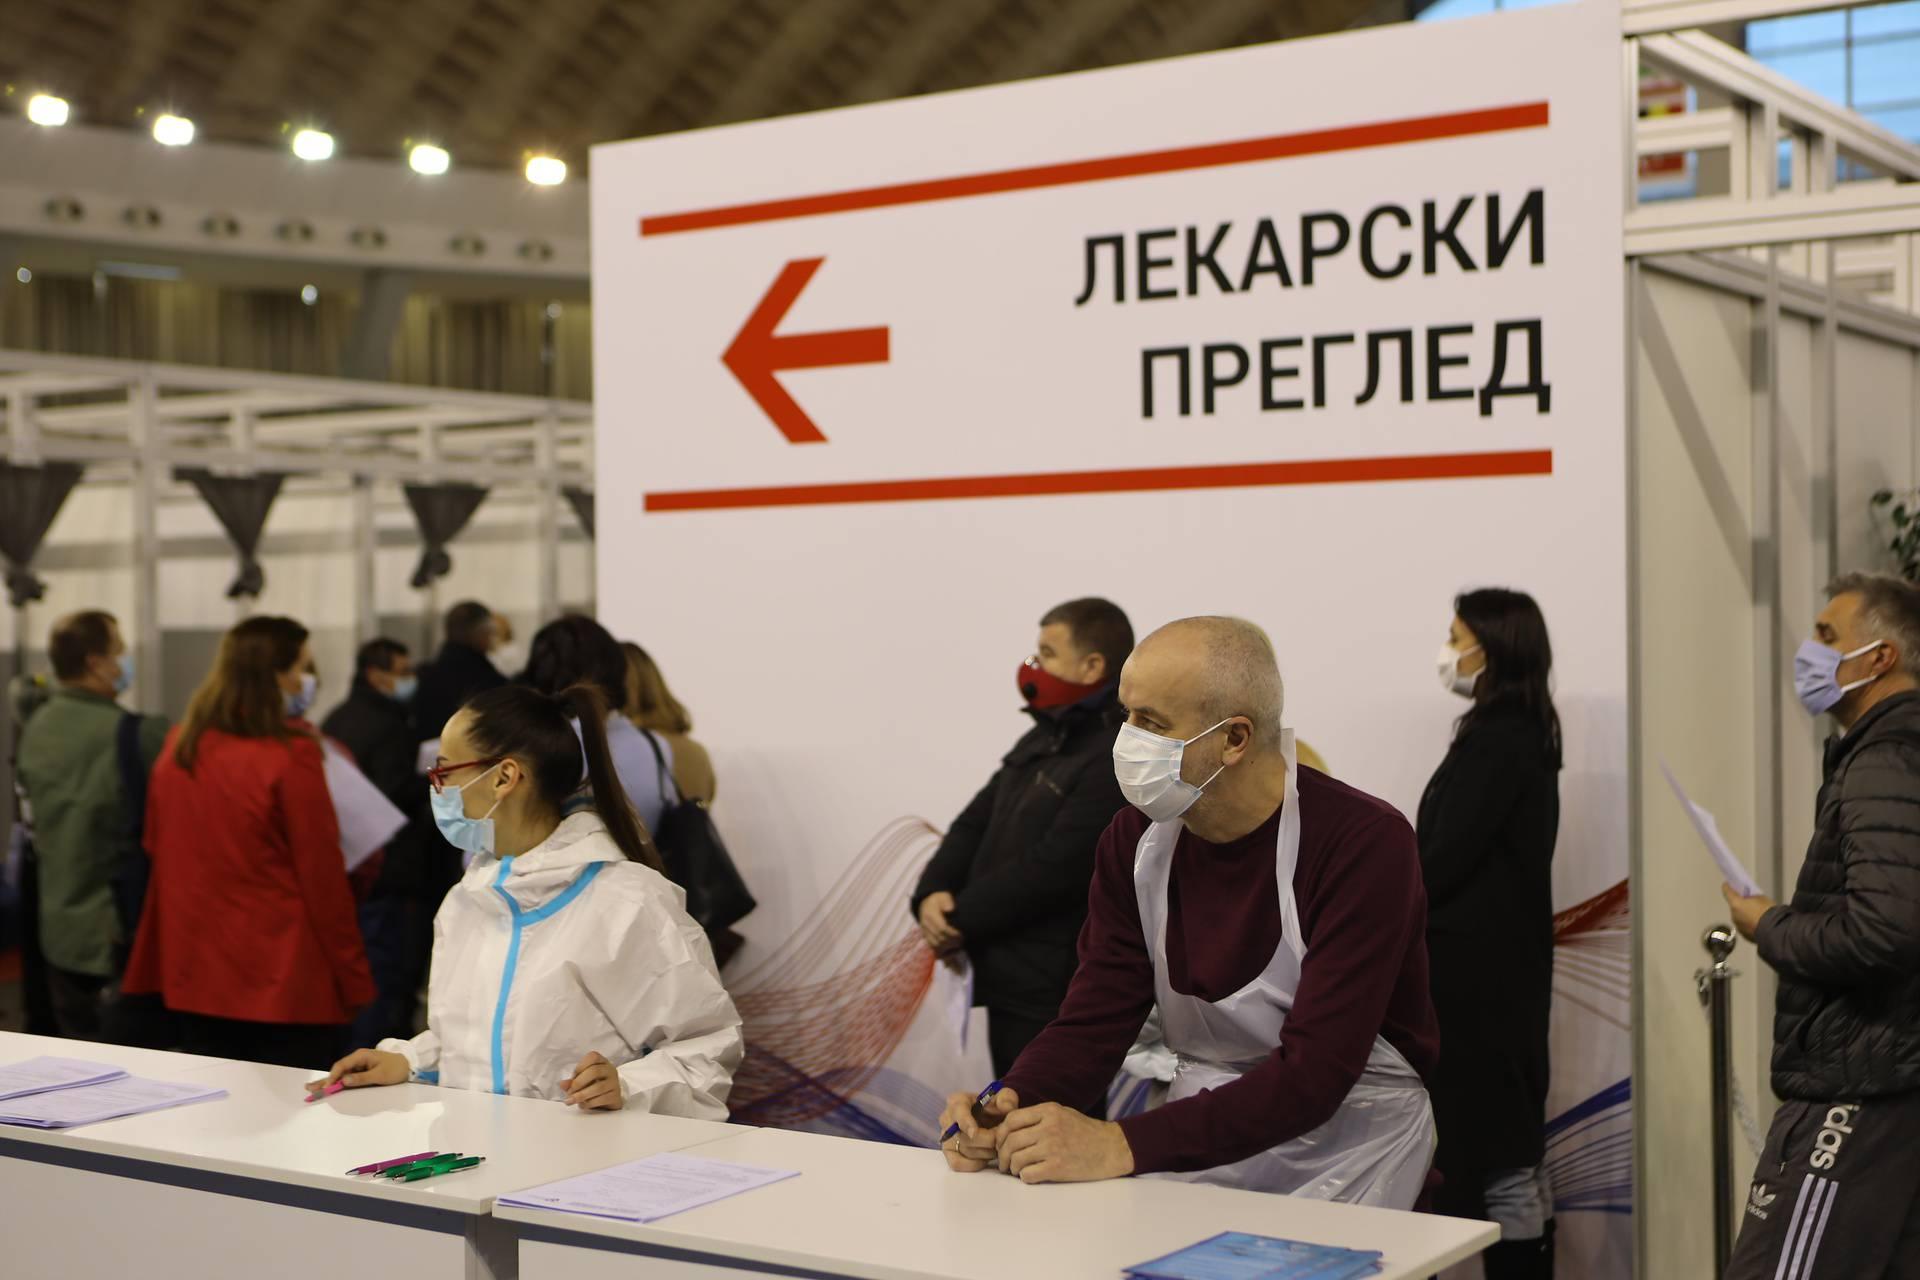 Vaccination of citizens, who registered through eGovernment, against the COVID-19 virus continues at the Belgrade fair.Na Beogradskom sajmu nastavlja se vakcinacija gradjana, koji su se prijavili preko eUprave, protiv virusa COVID-19.